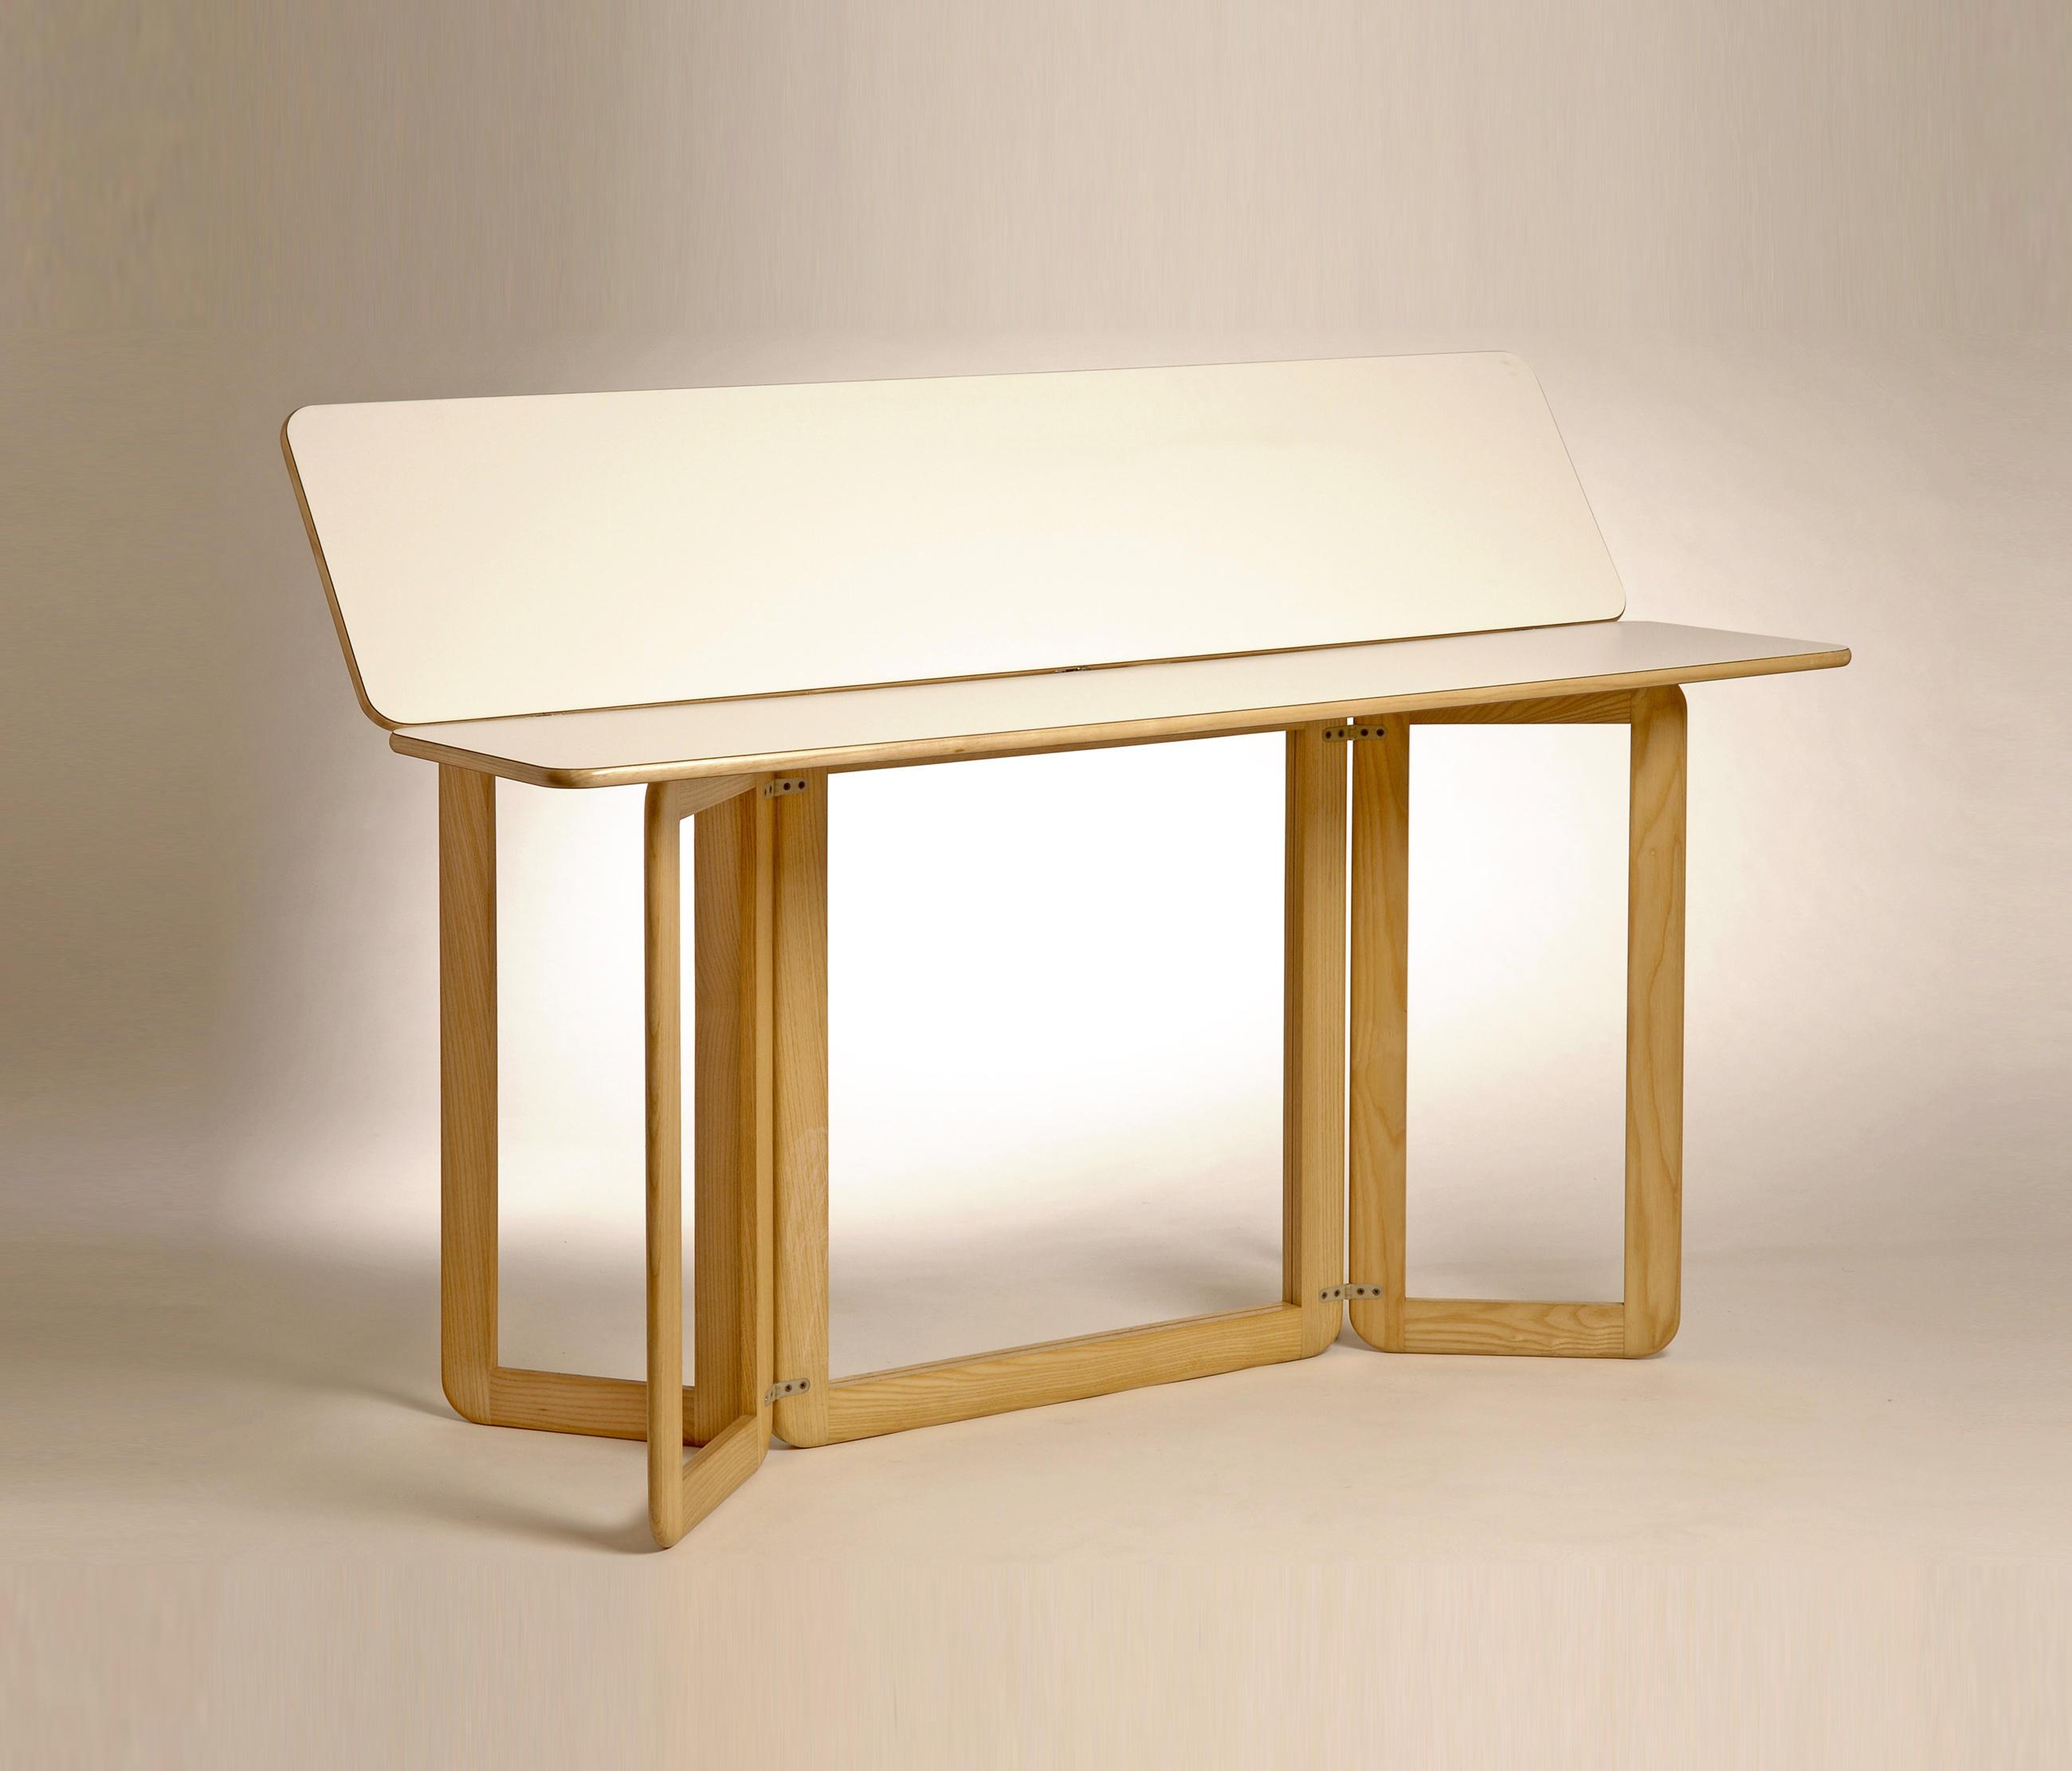 Libro mesas comedor de mc selvini architonic - Mesa libro comedor ...